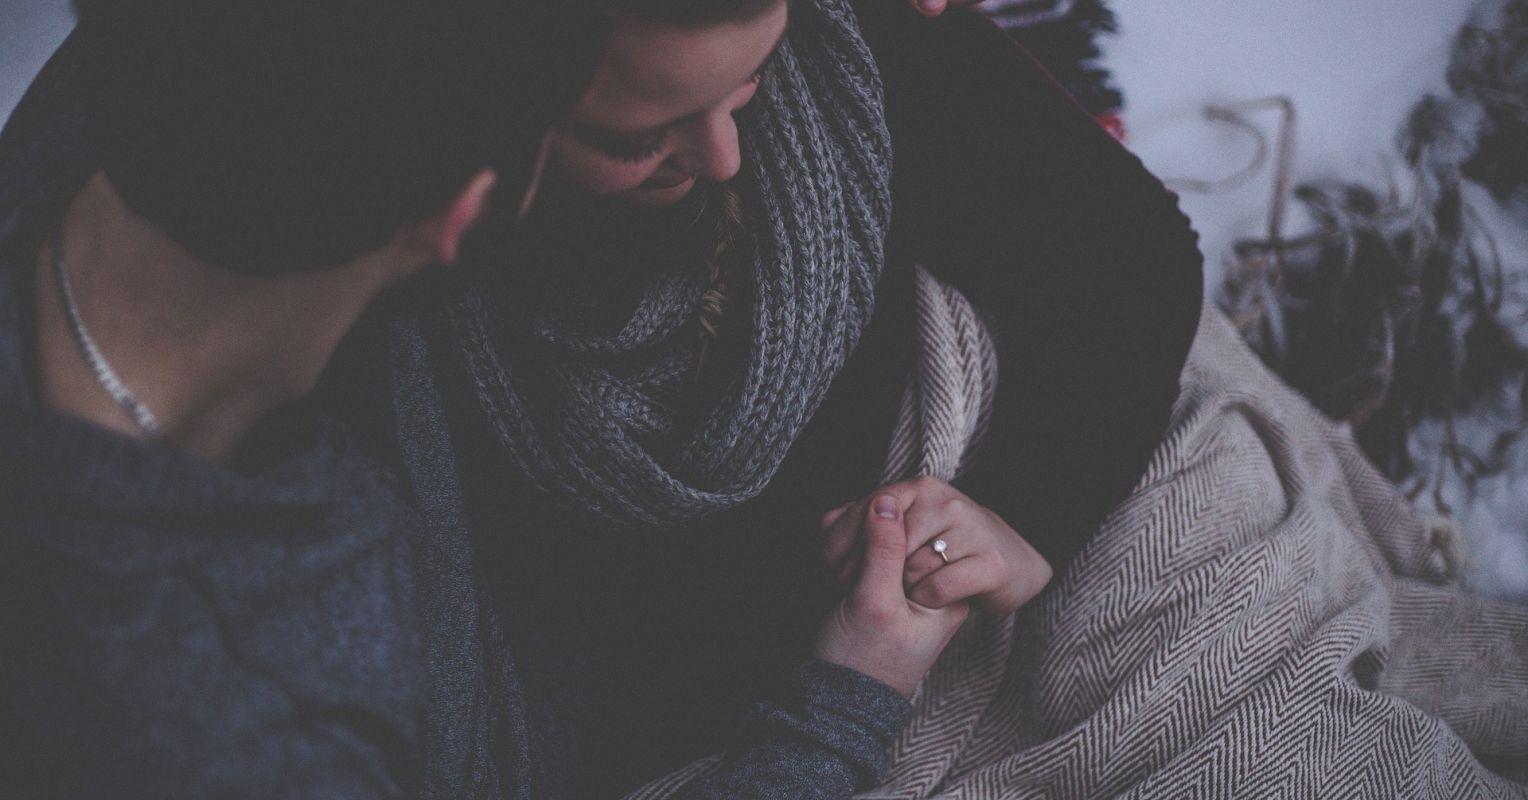 Psychology behind cuddling